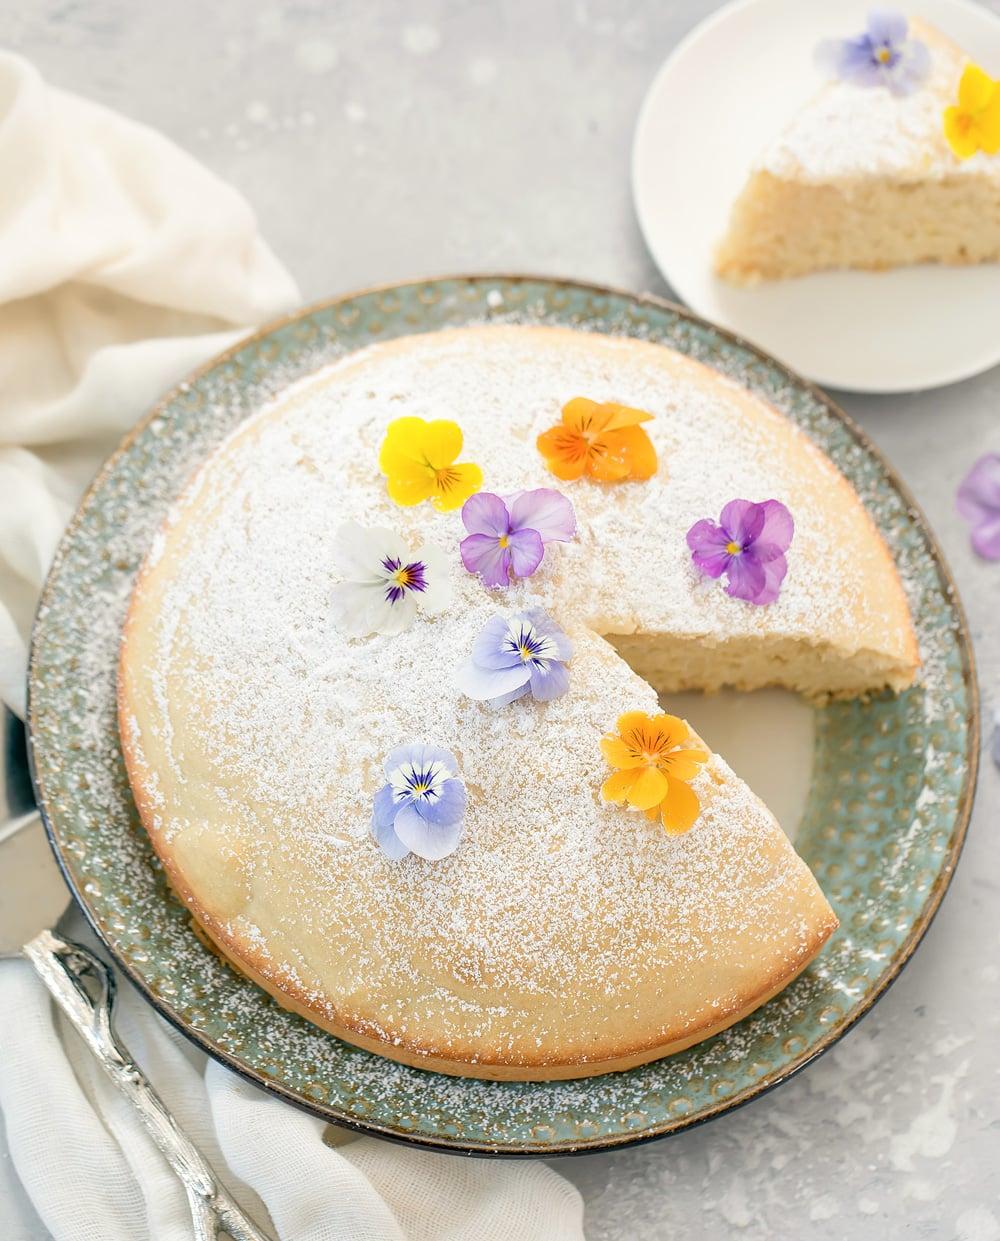 Water Cake No Eggs Butter Or Milk Kirbie S Cravings